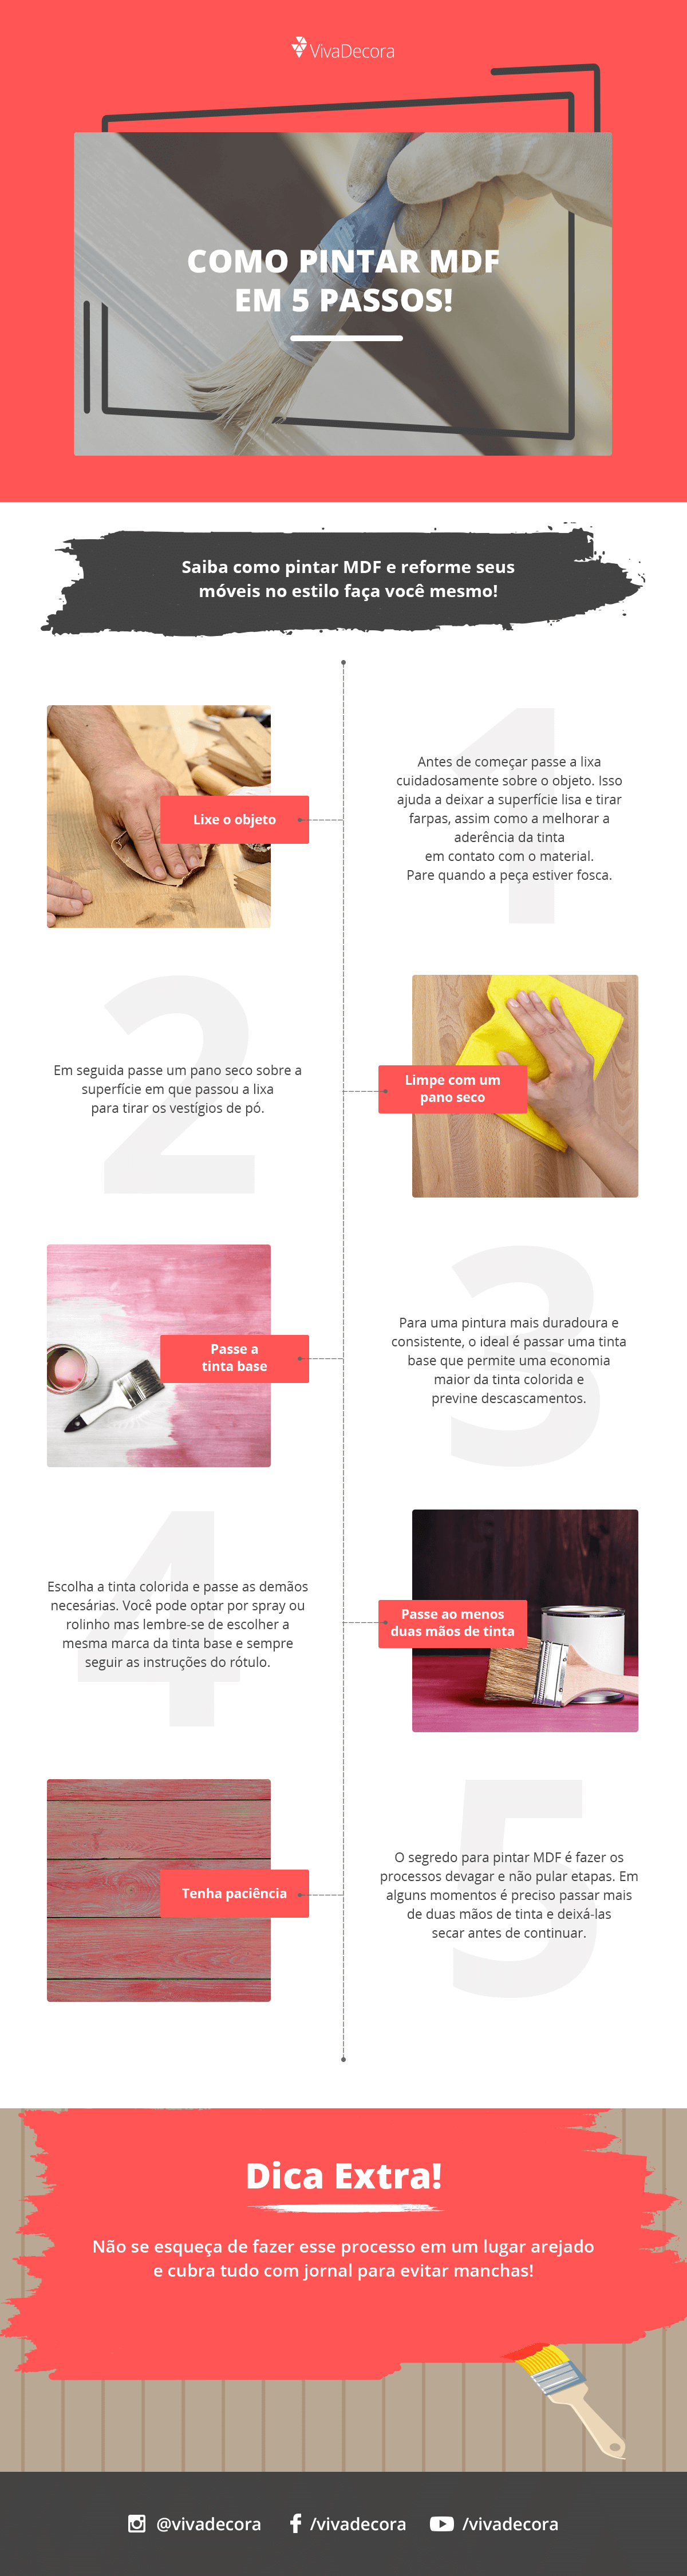 Infográfico - Como Pintar MDF